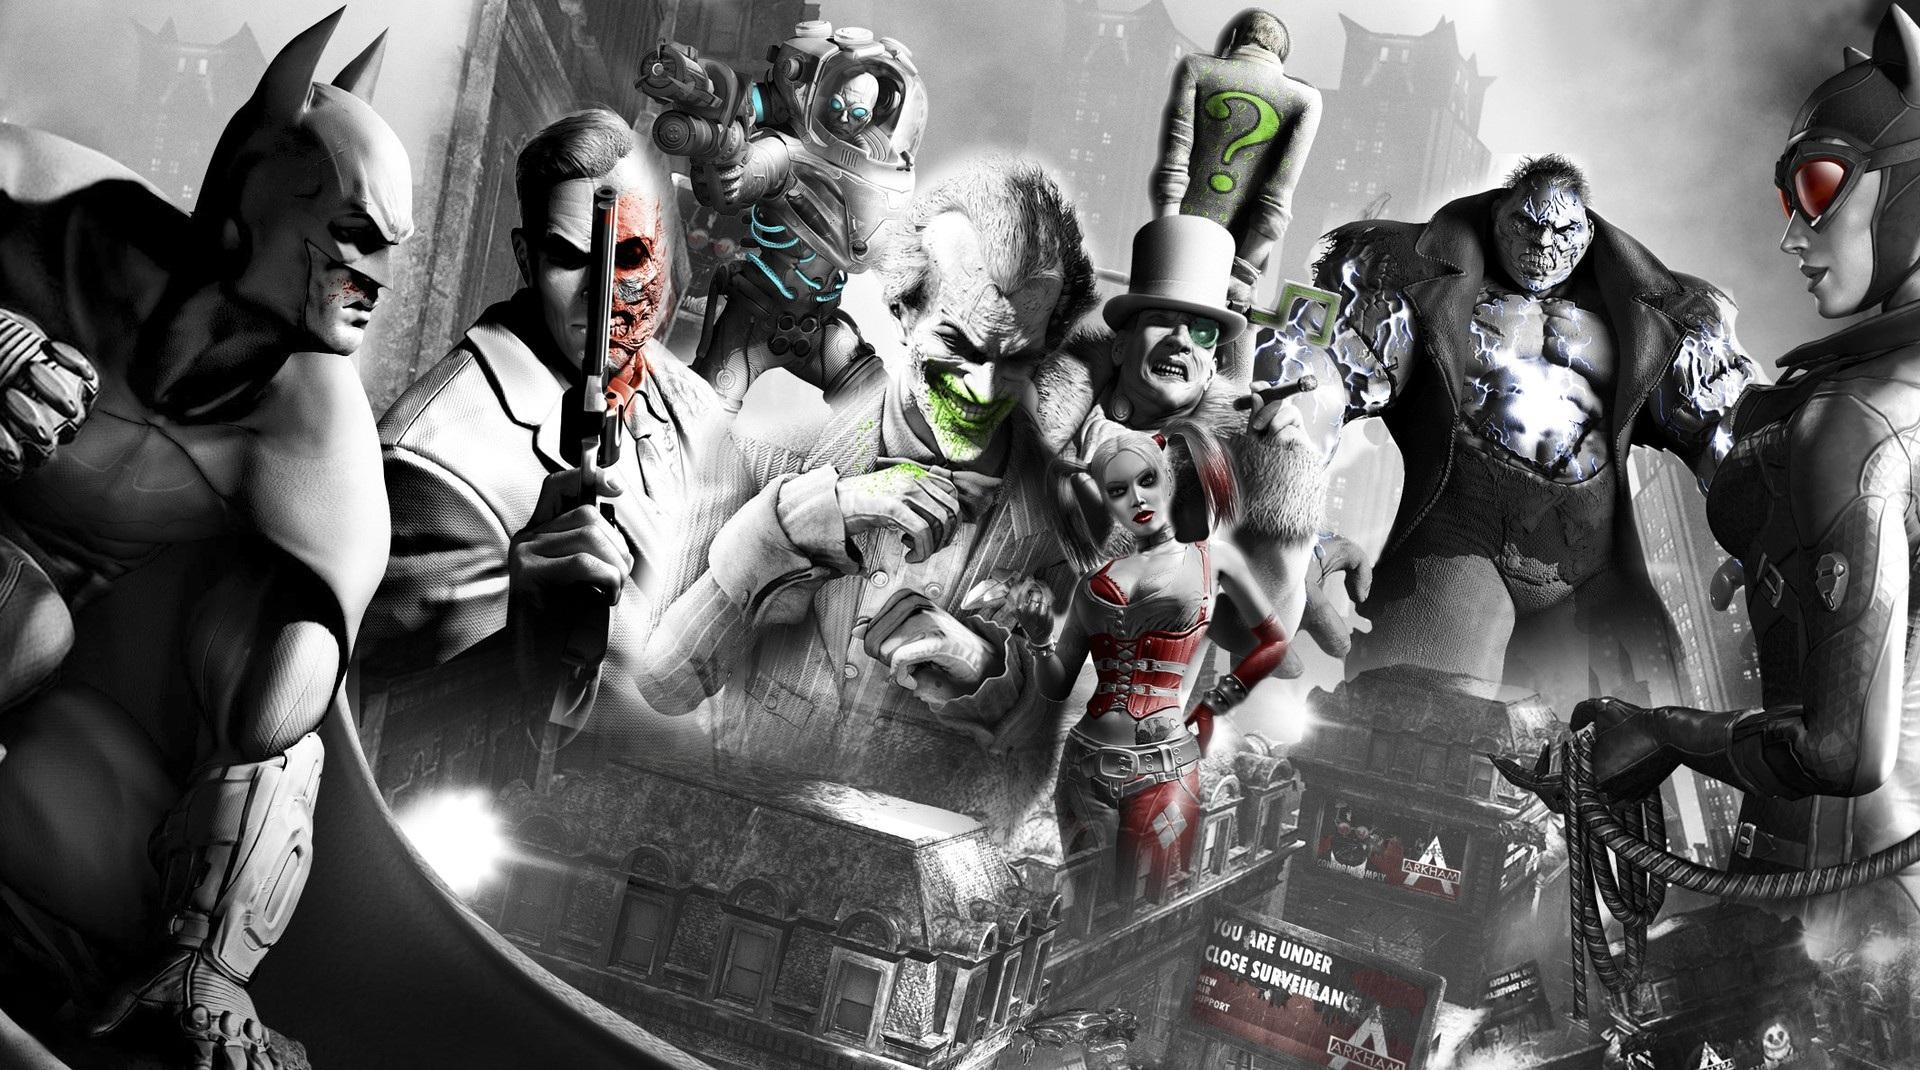 batman arkham city desktop wallpaper - wallpapersafari